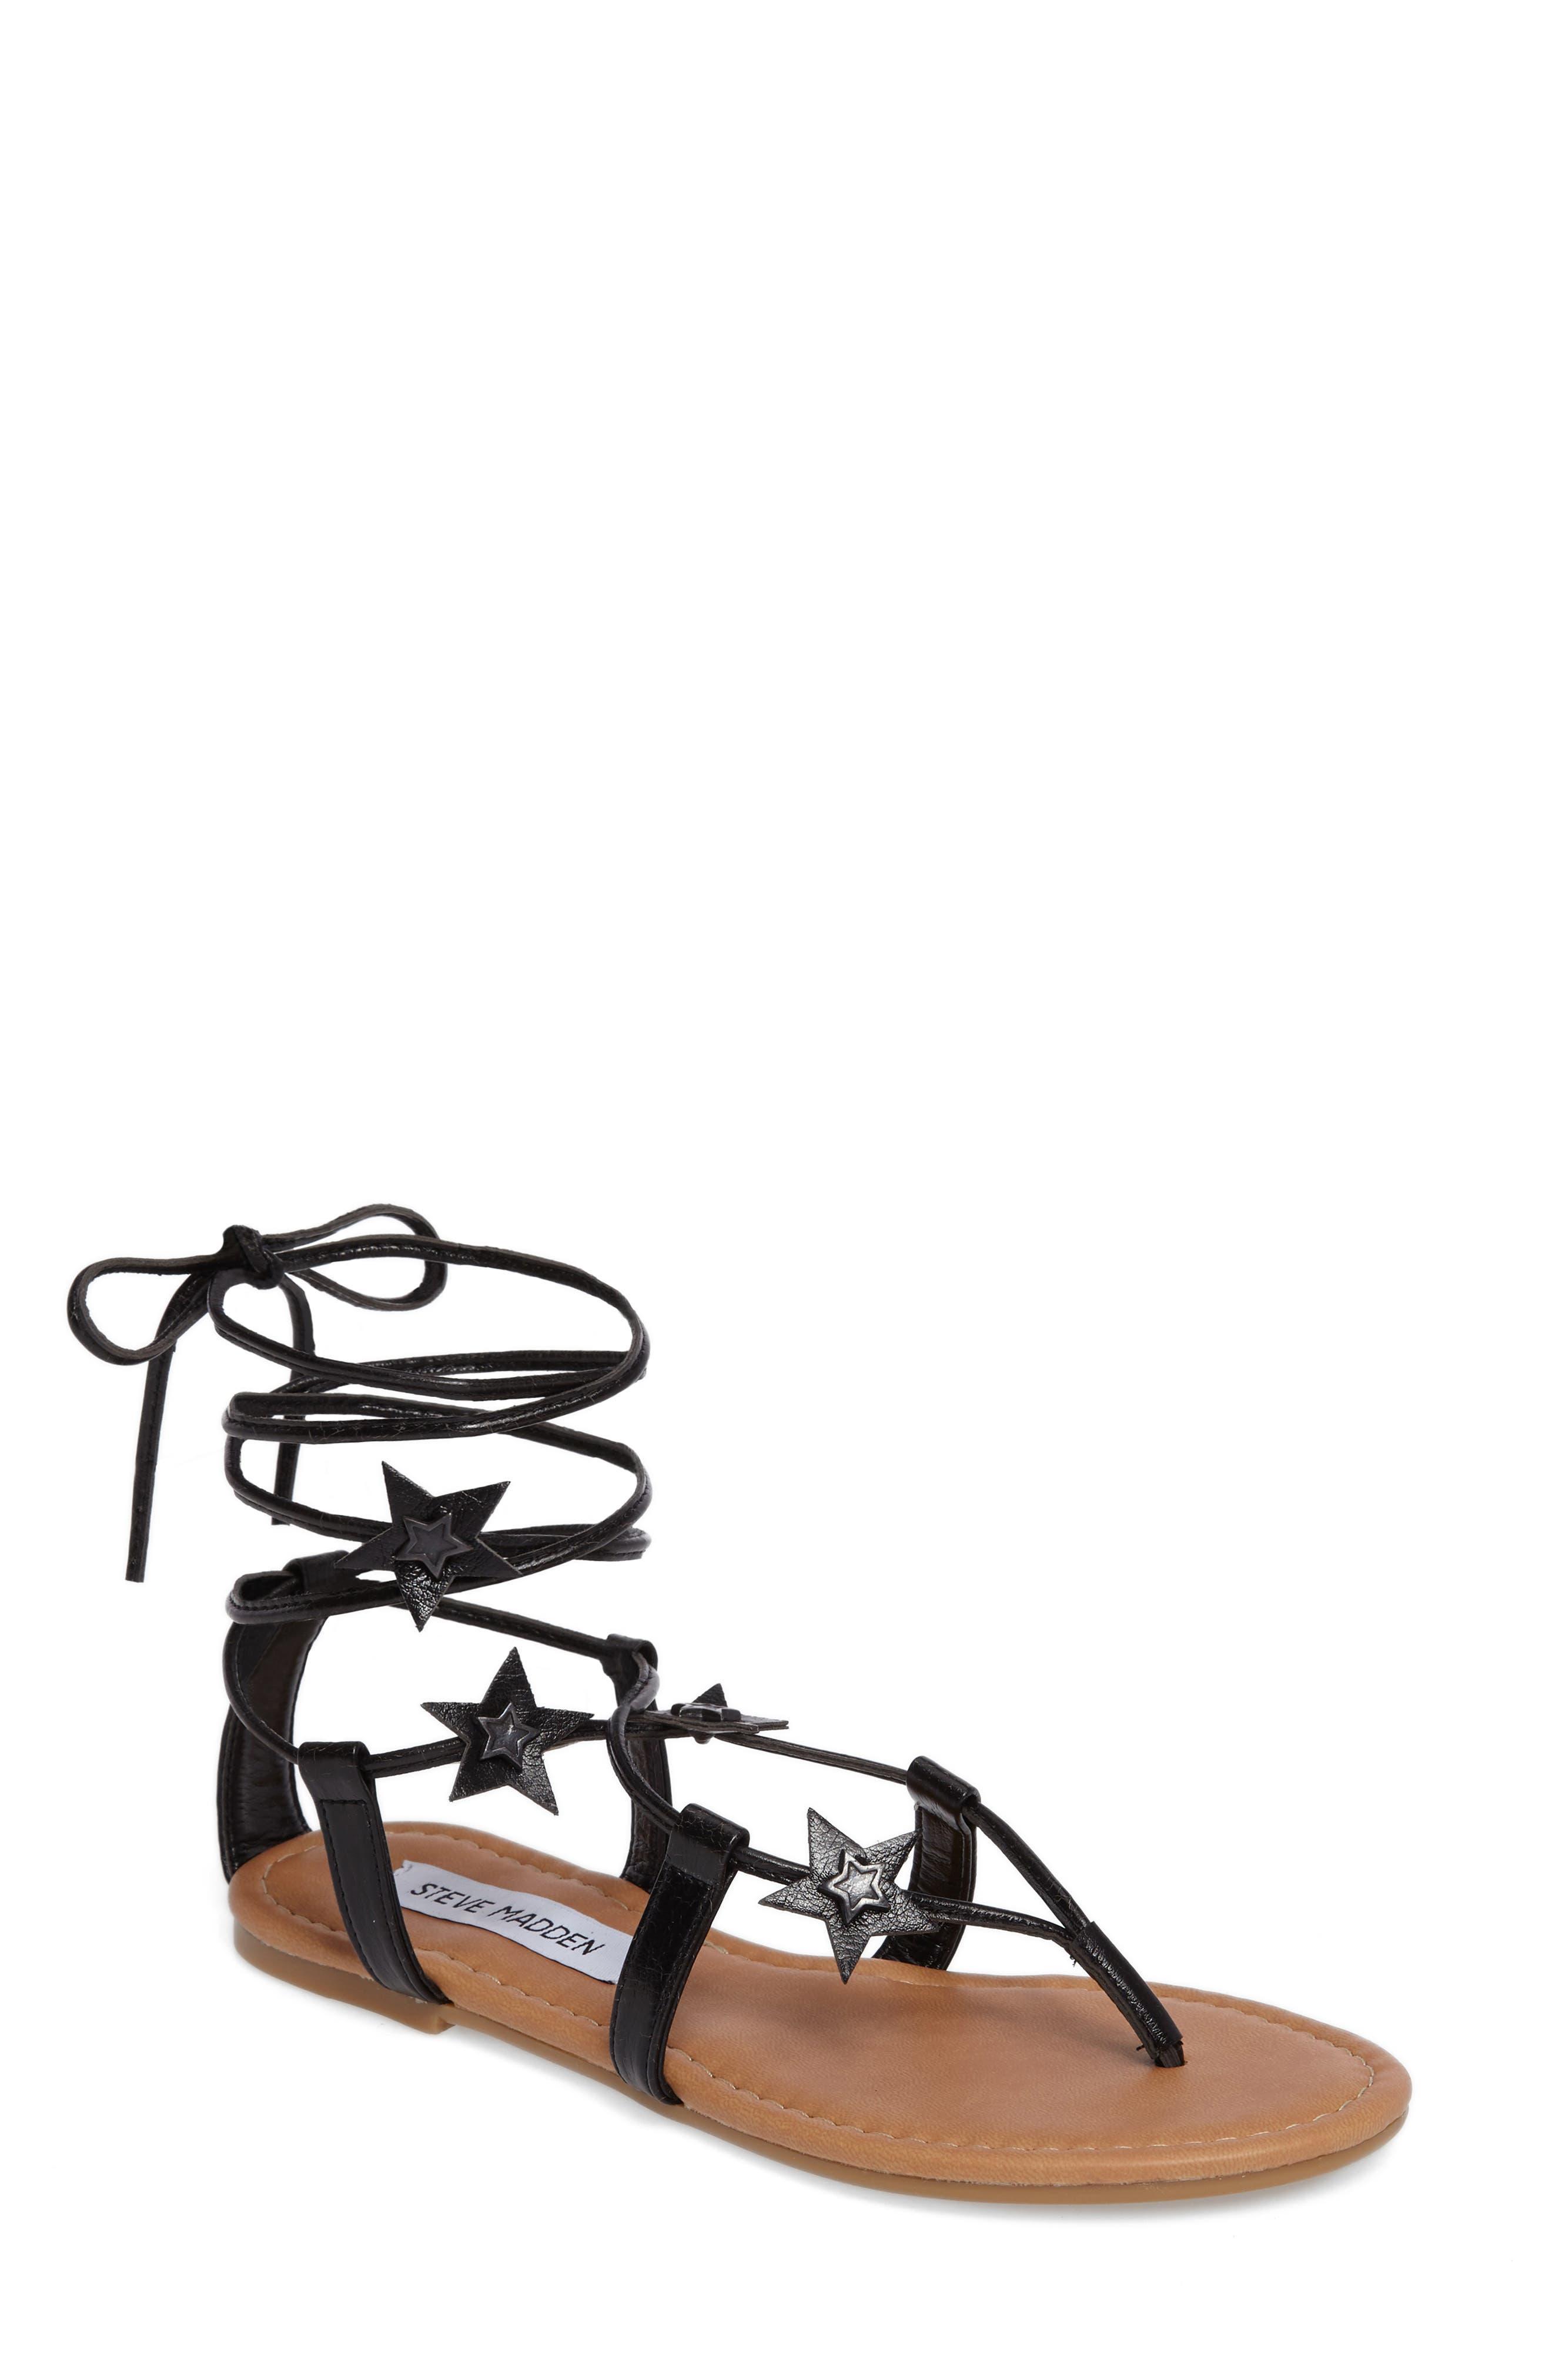 Main Image - Steve Madden Jupiter Lace Up Sandal (Women)